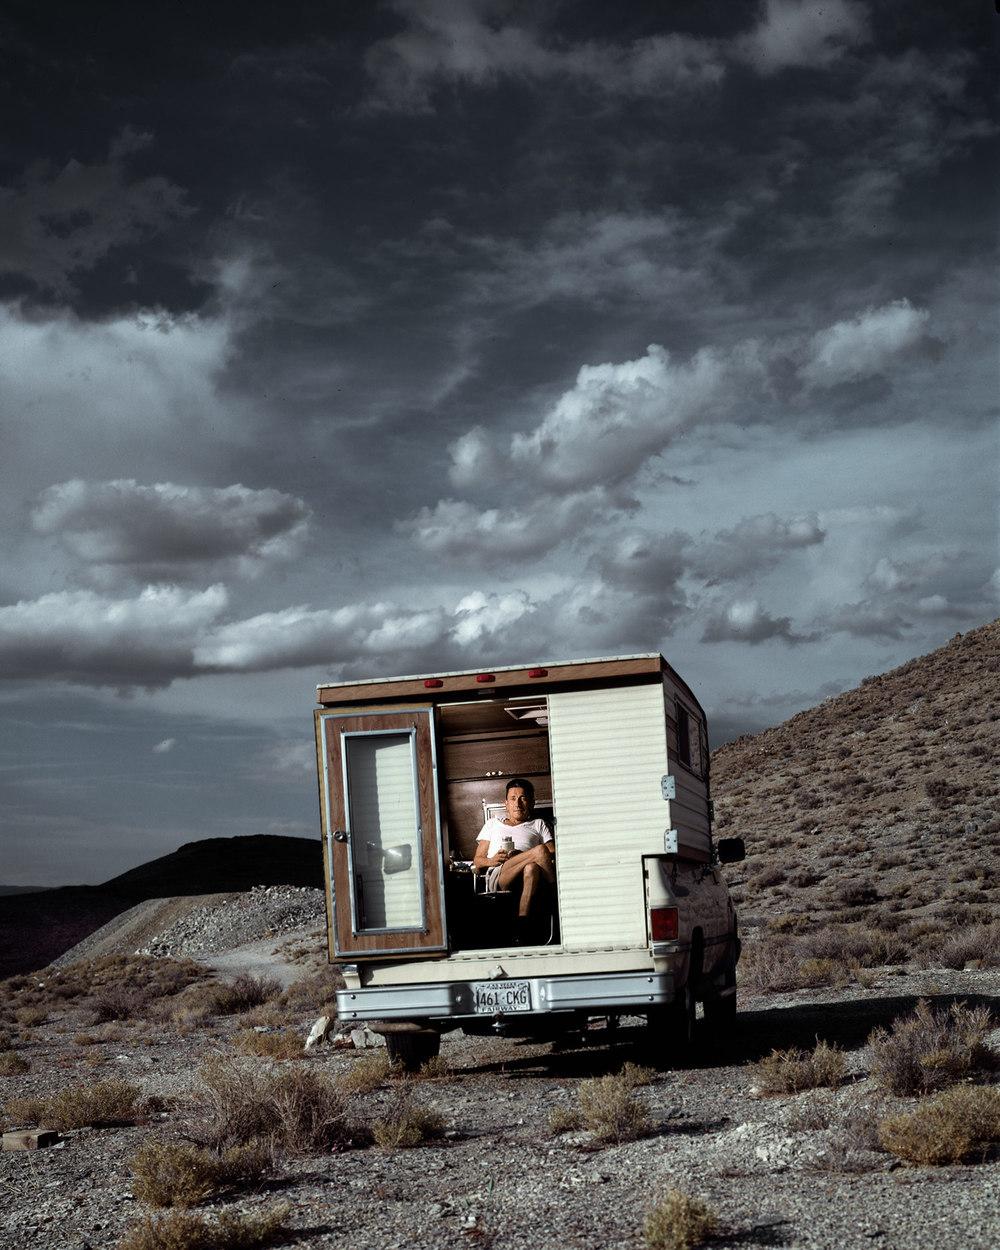 Deaf man in his camper, Mojave Desert.